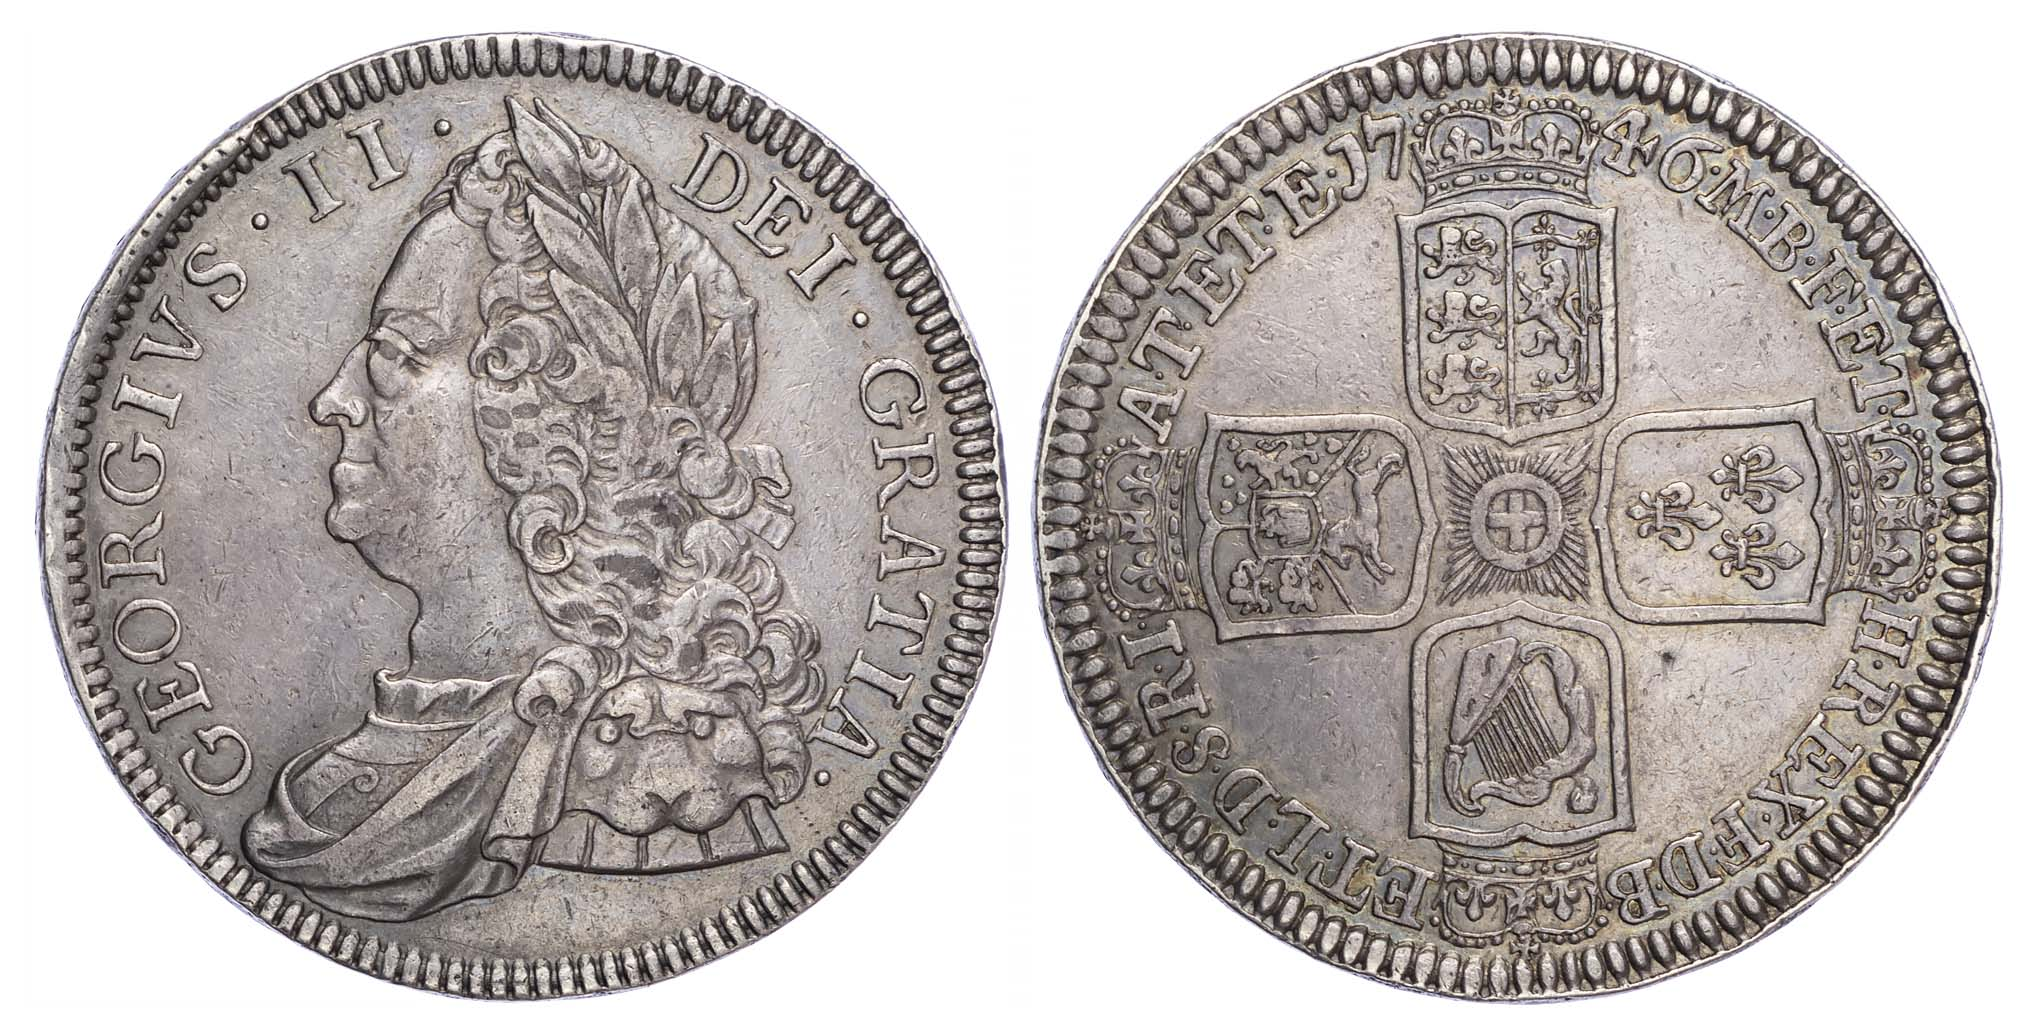 George II (1727-60), Proof Crown, 1746, Vicesimo